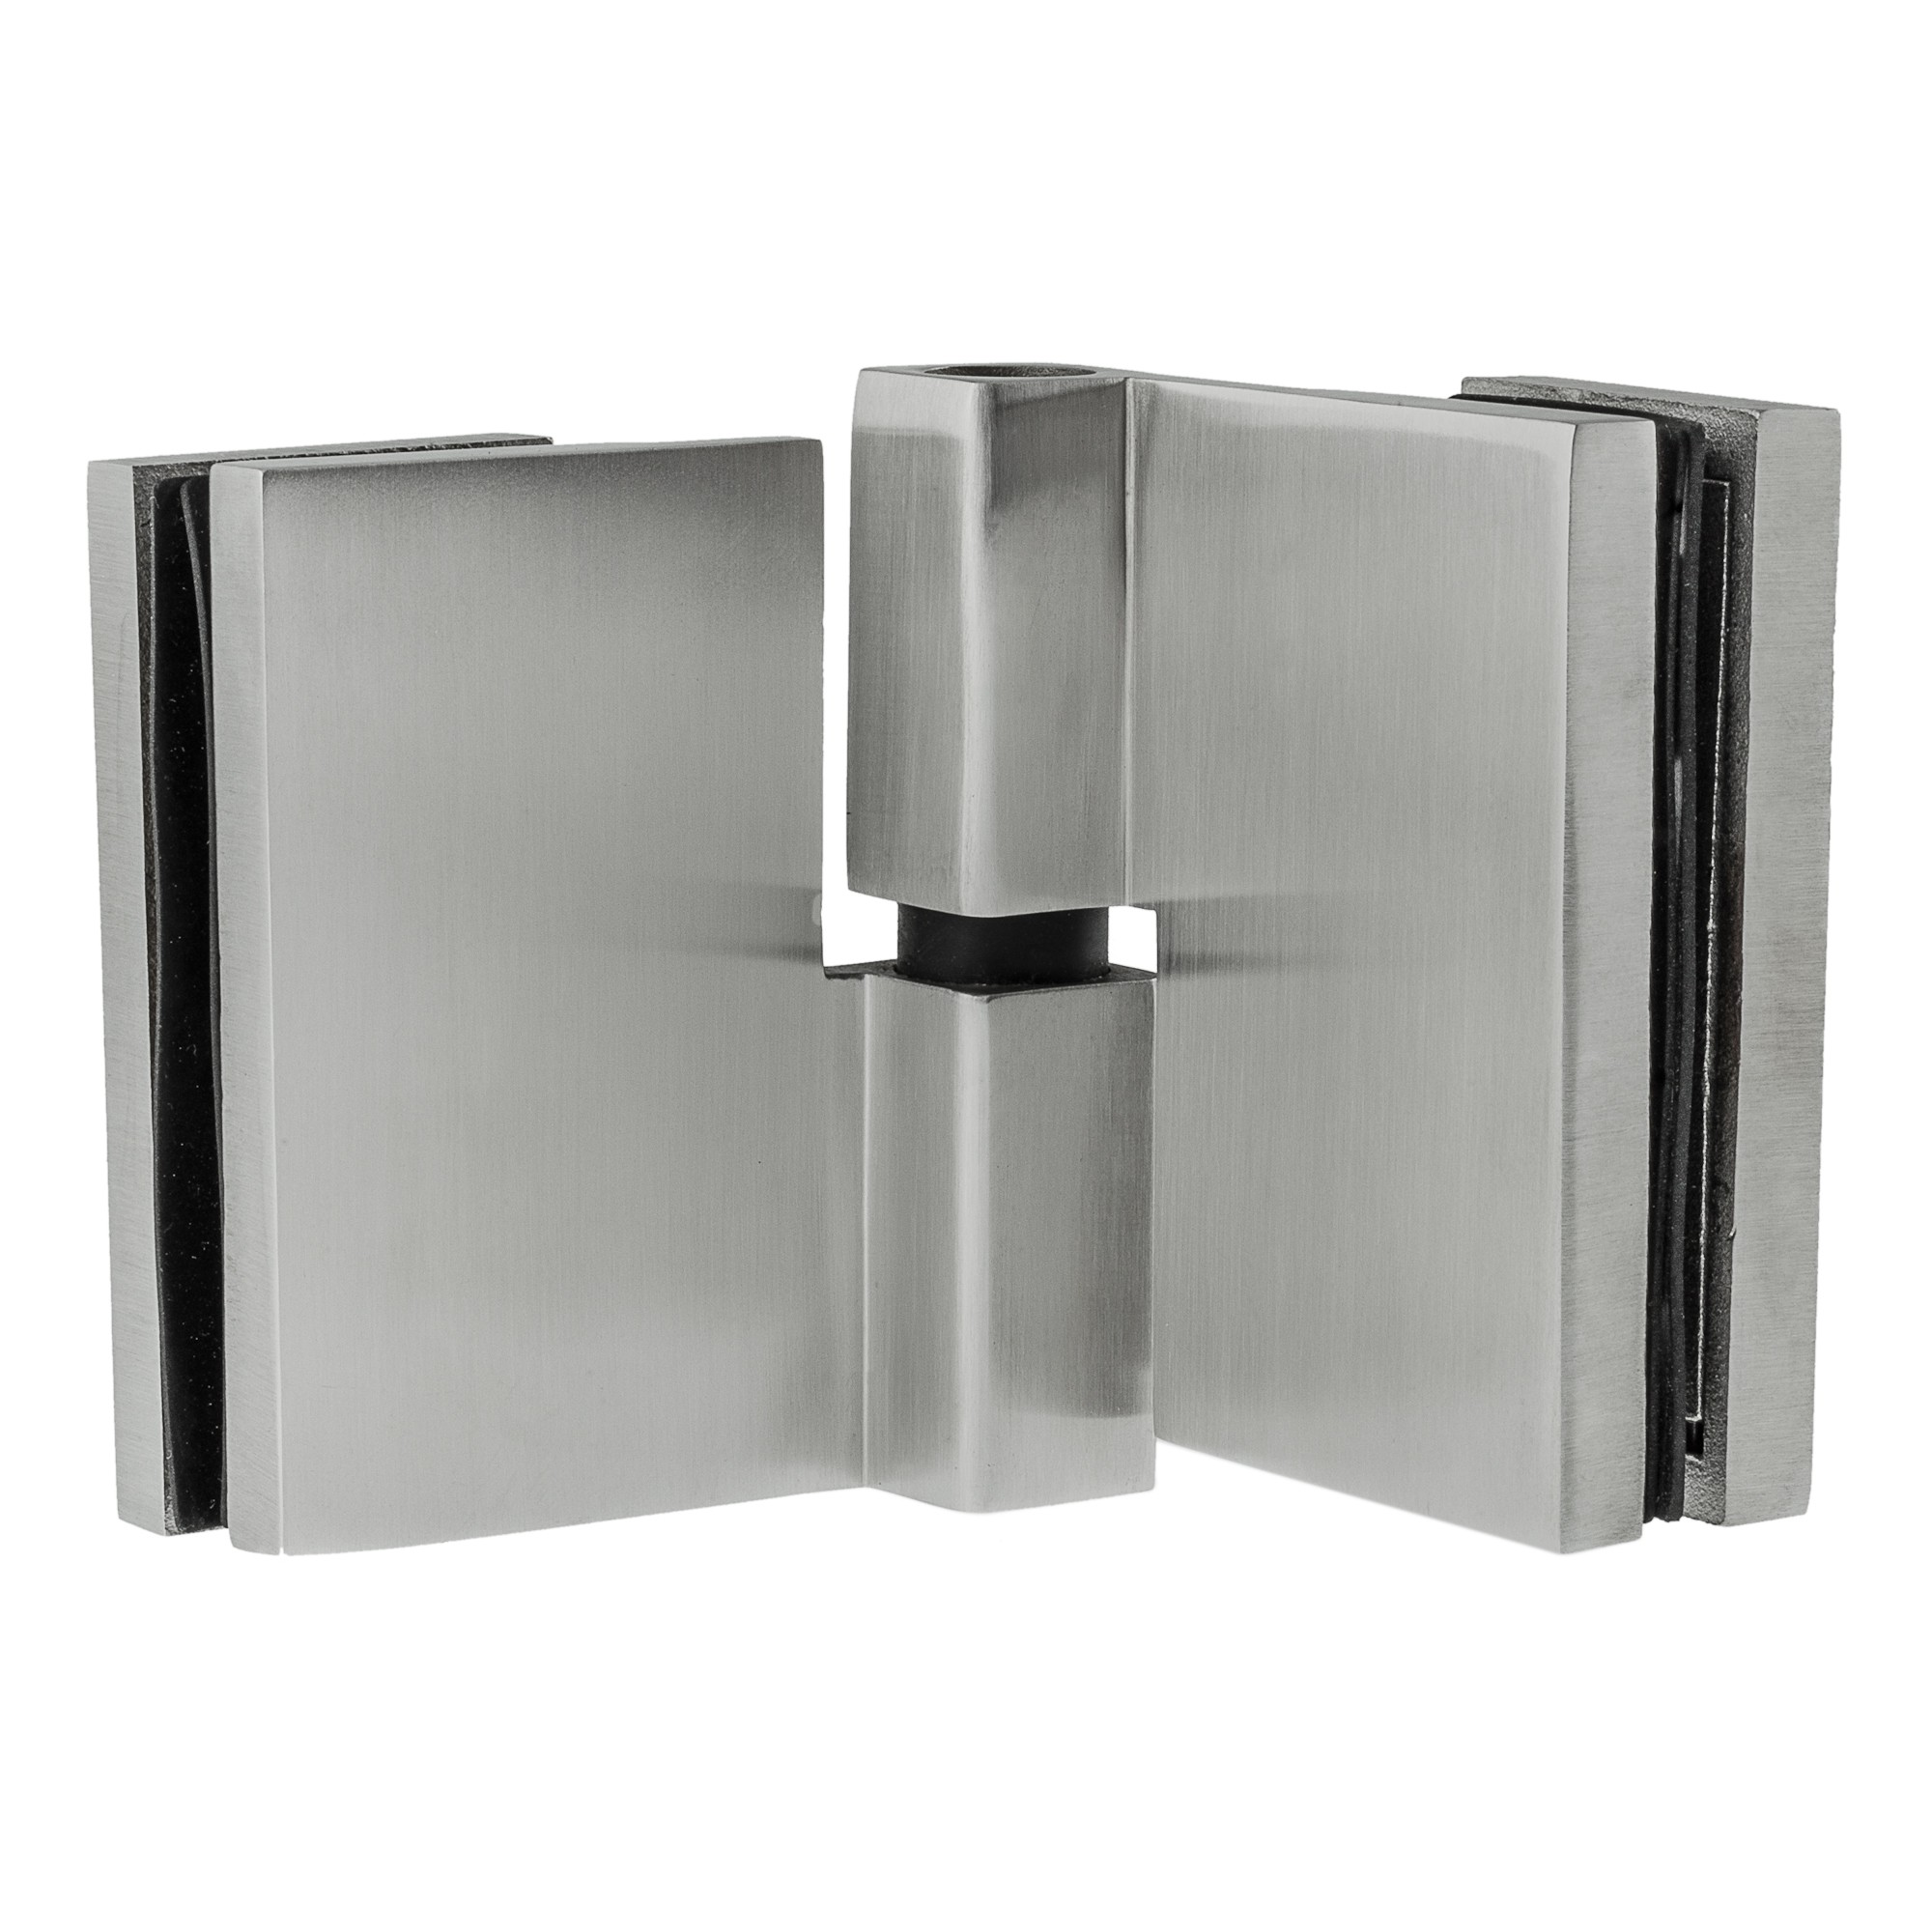 Stangenscharnier 80 x 30 mm Edelstahlscharnier Tür Hinge Silber